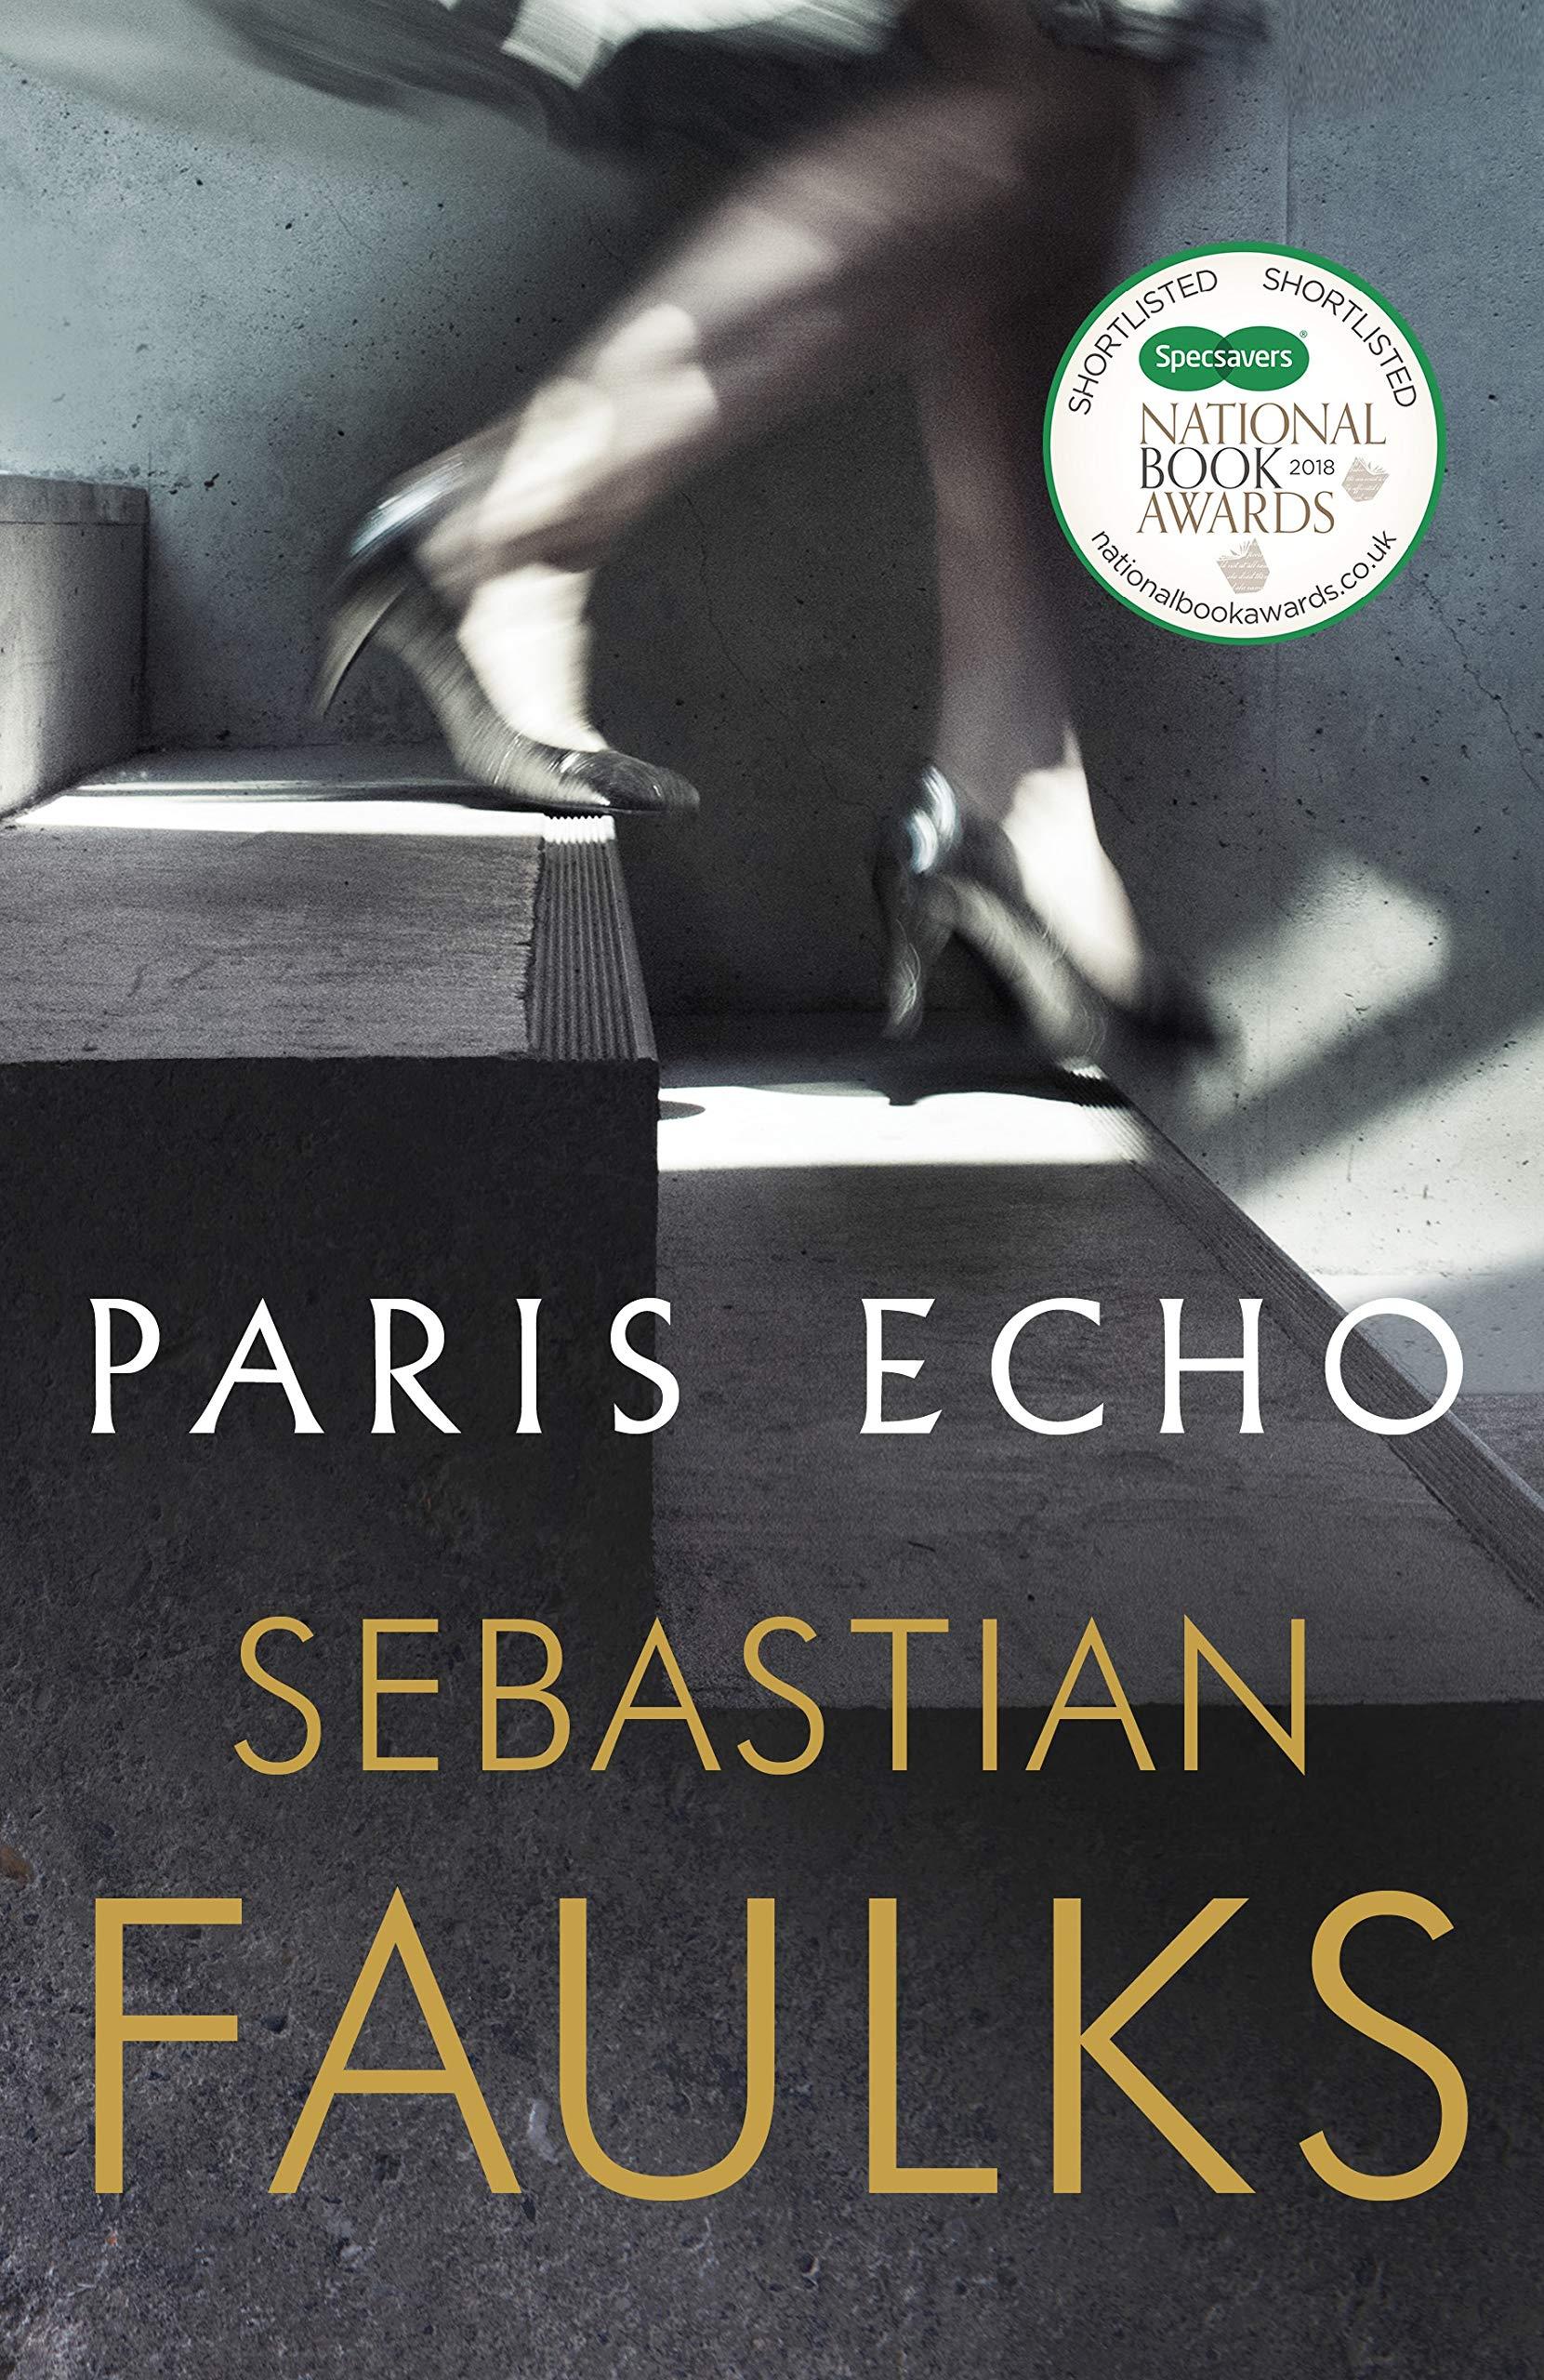 Image result for paris echo sebastian faulks